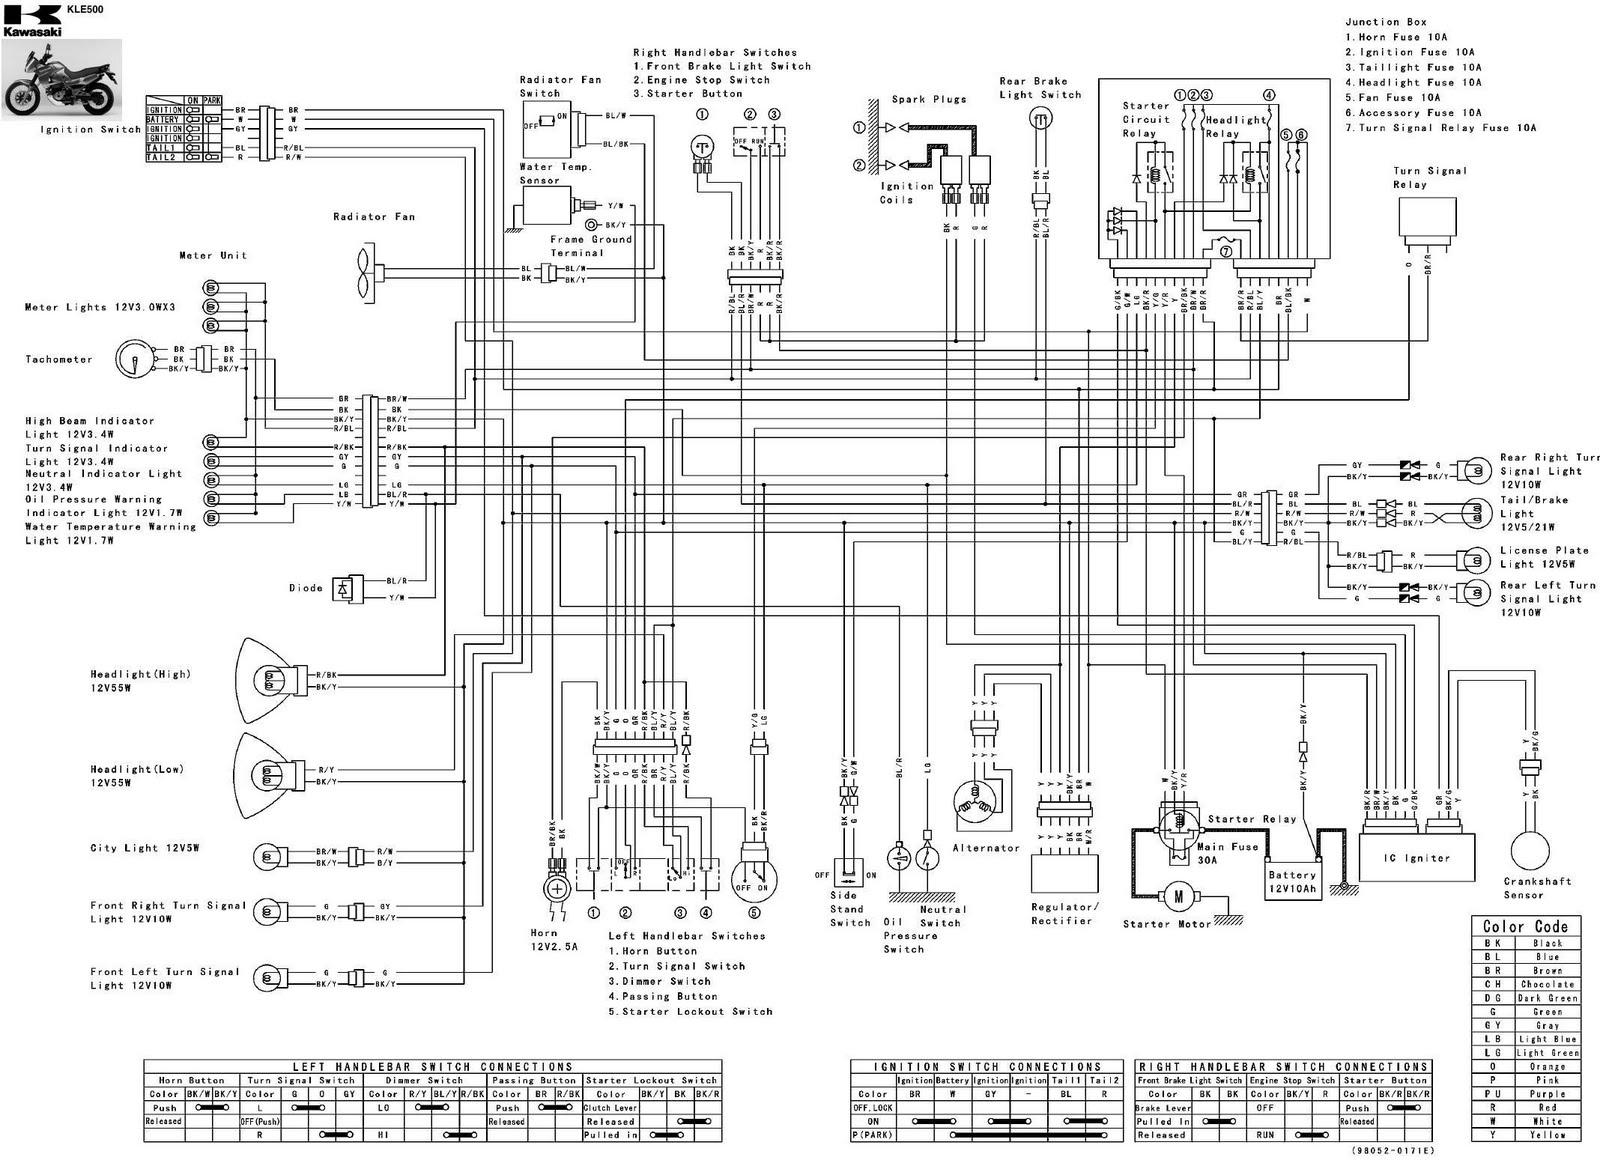 2006 Kawasaki Zzr 600 Wiring Diagram. Diagram. Auto Wiring